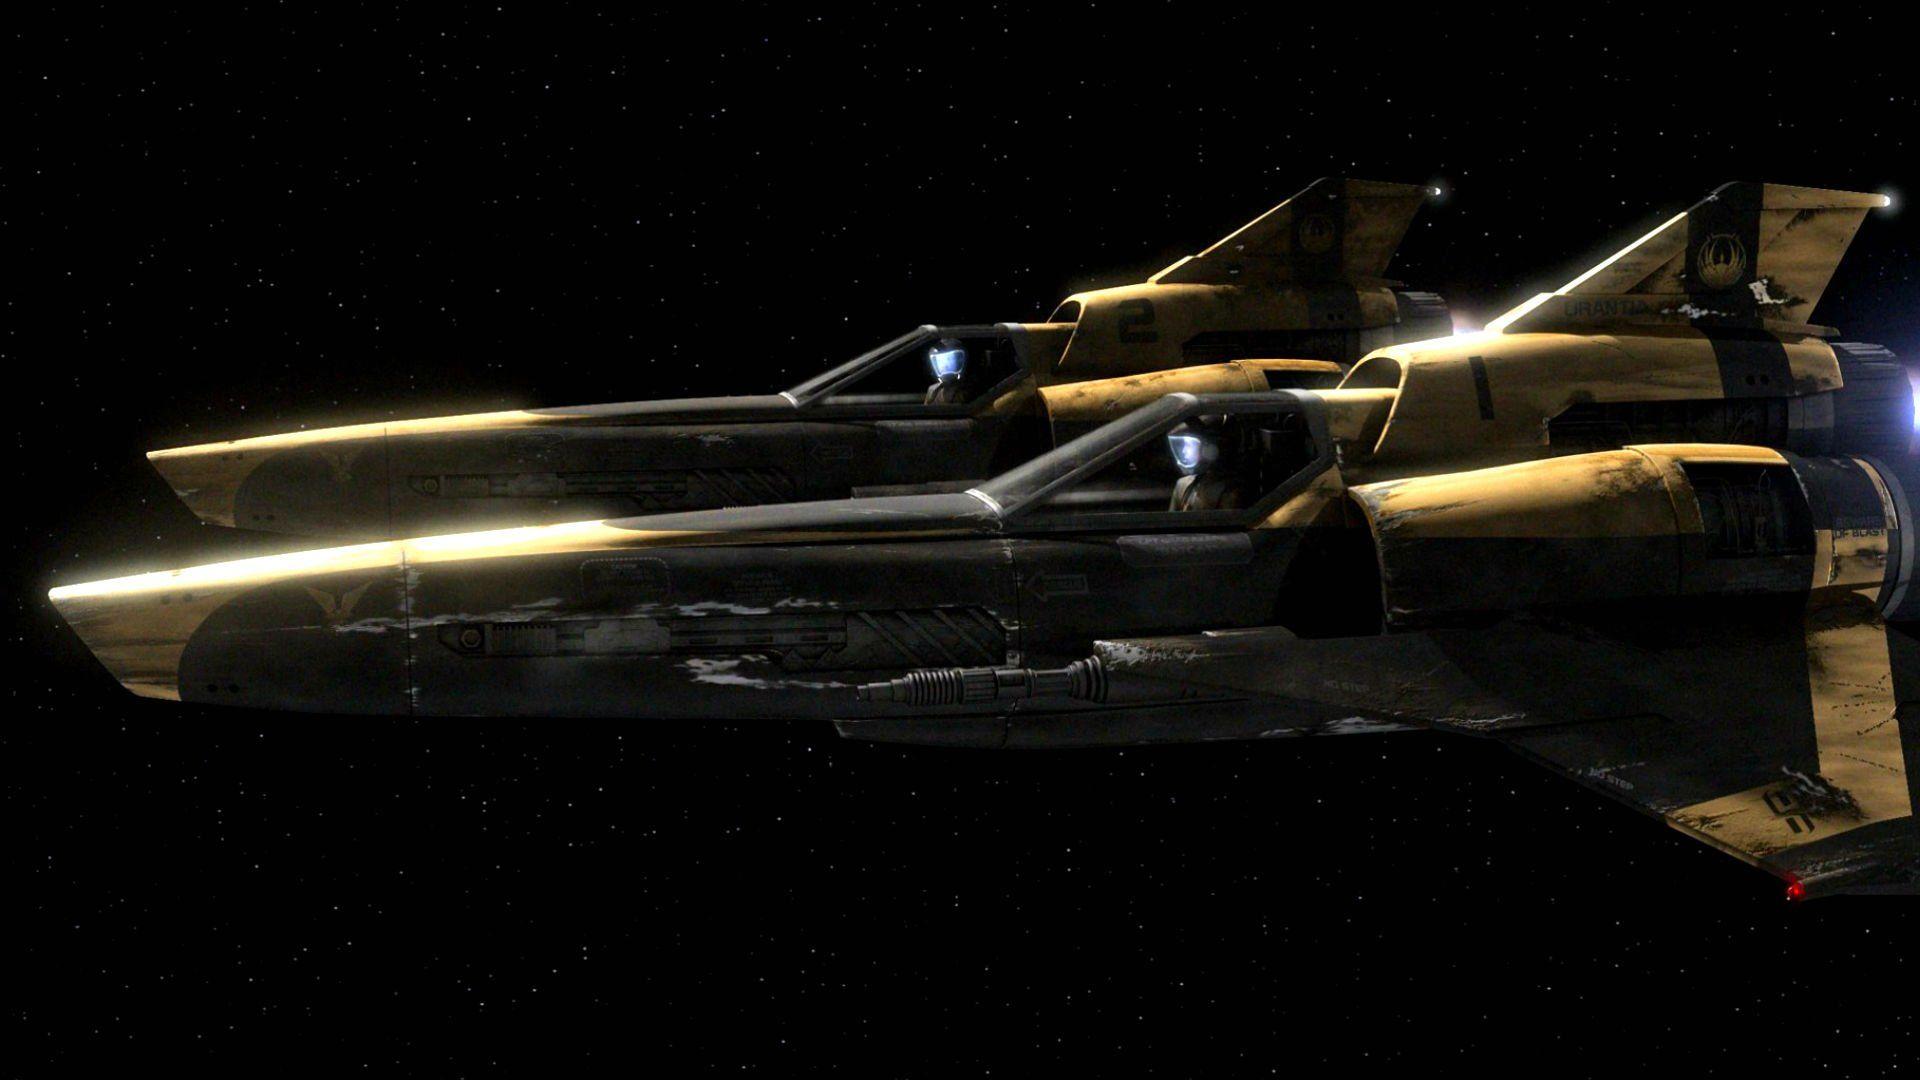 Battlestar Galactica Action Adventure Drama Sci Fi Spaceship Wallpaper Battlestar Galactica Viper Sci Fi Spaceship